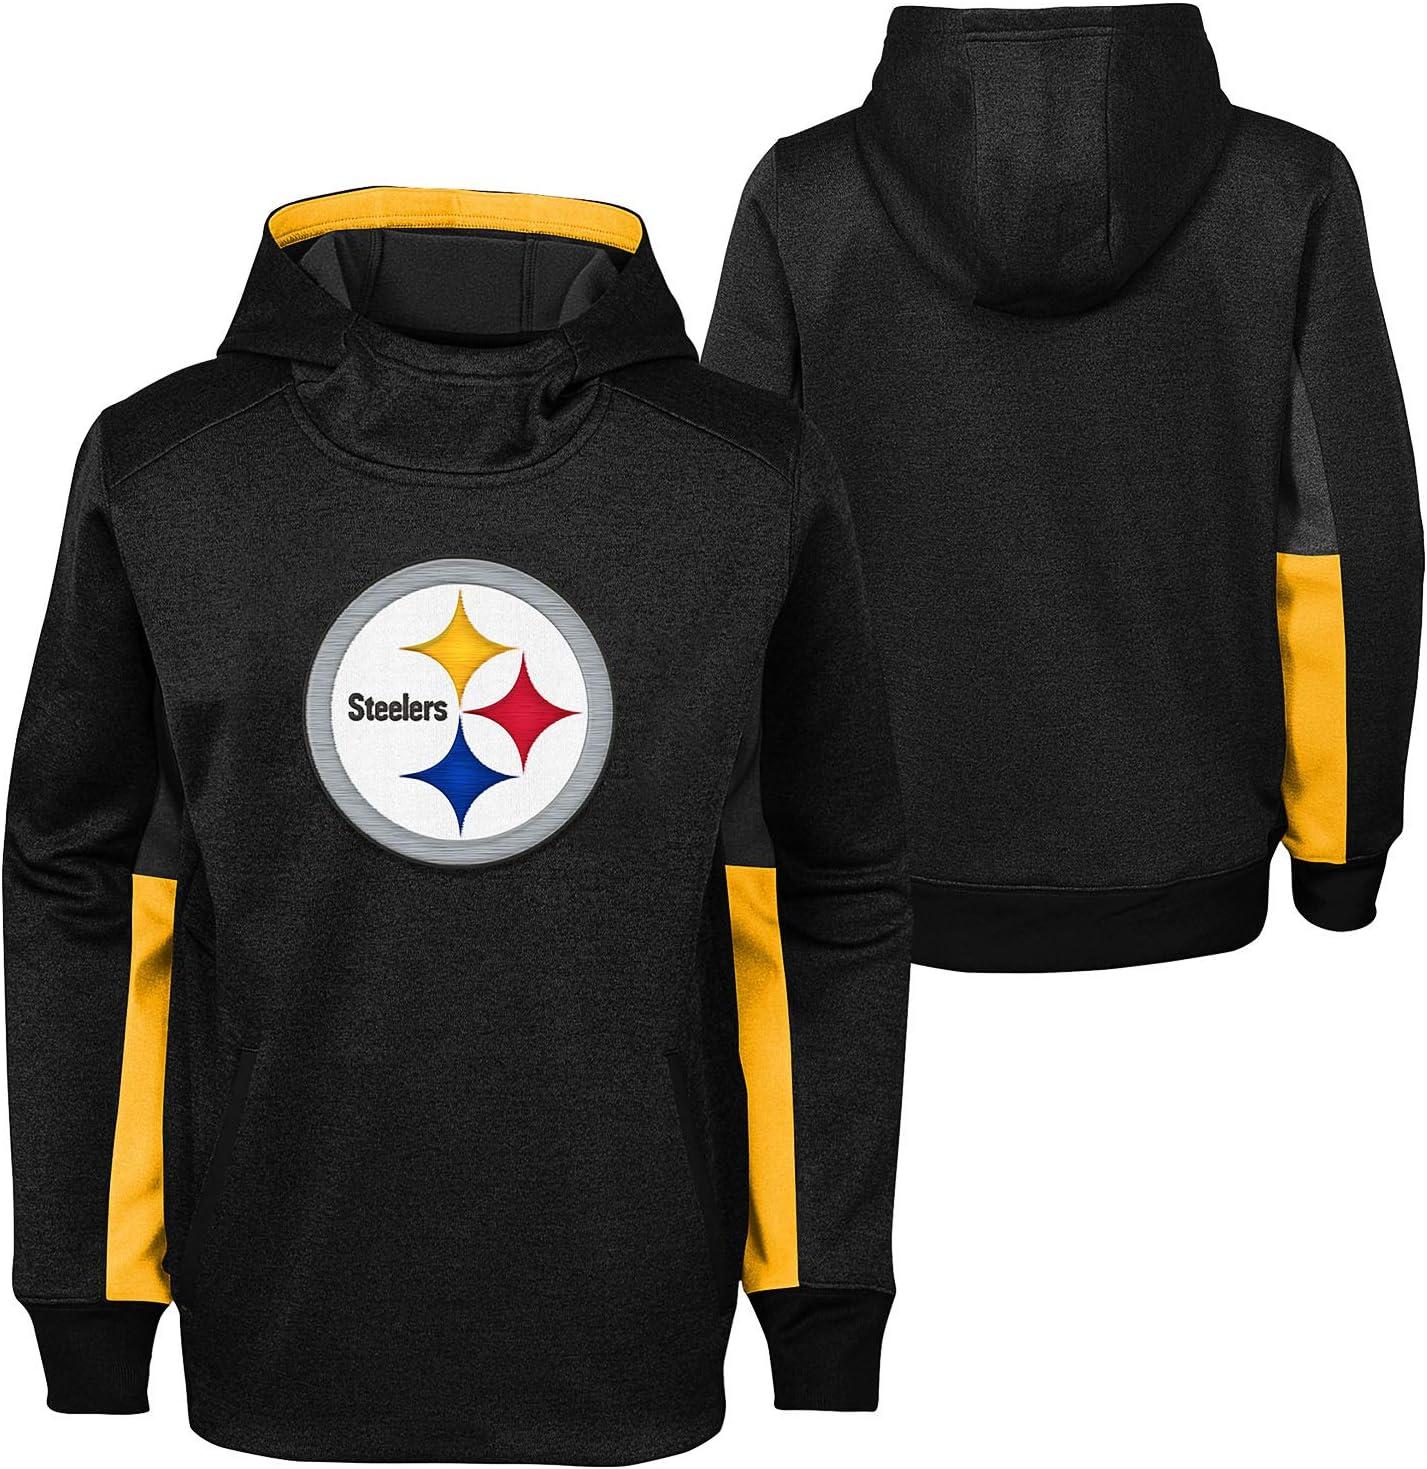 14-16 OuterStuff Youth NFL Status PO Sweatshirt Hoodie , Pittsburgh Steelers Large